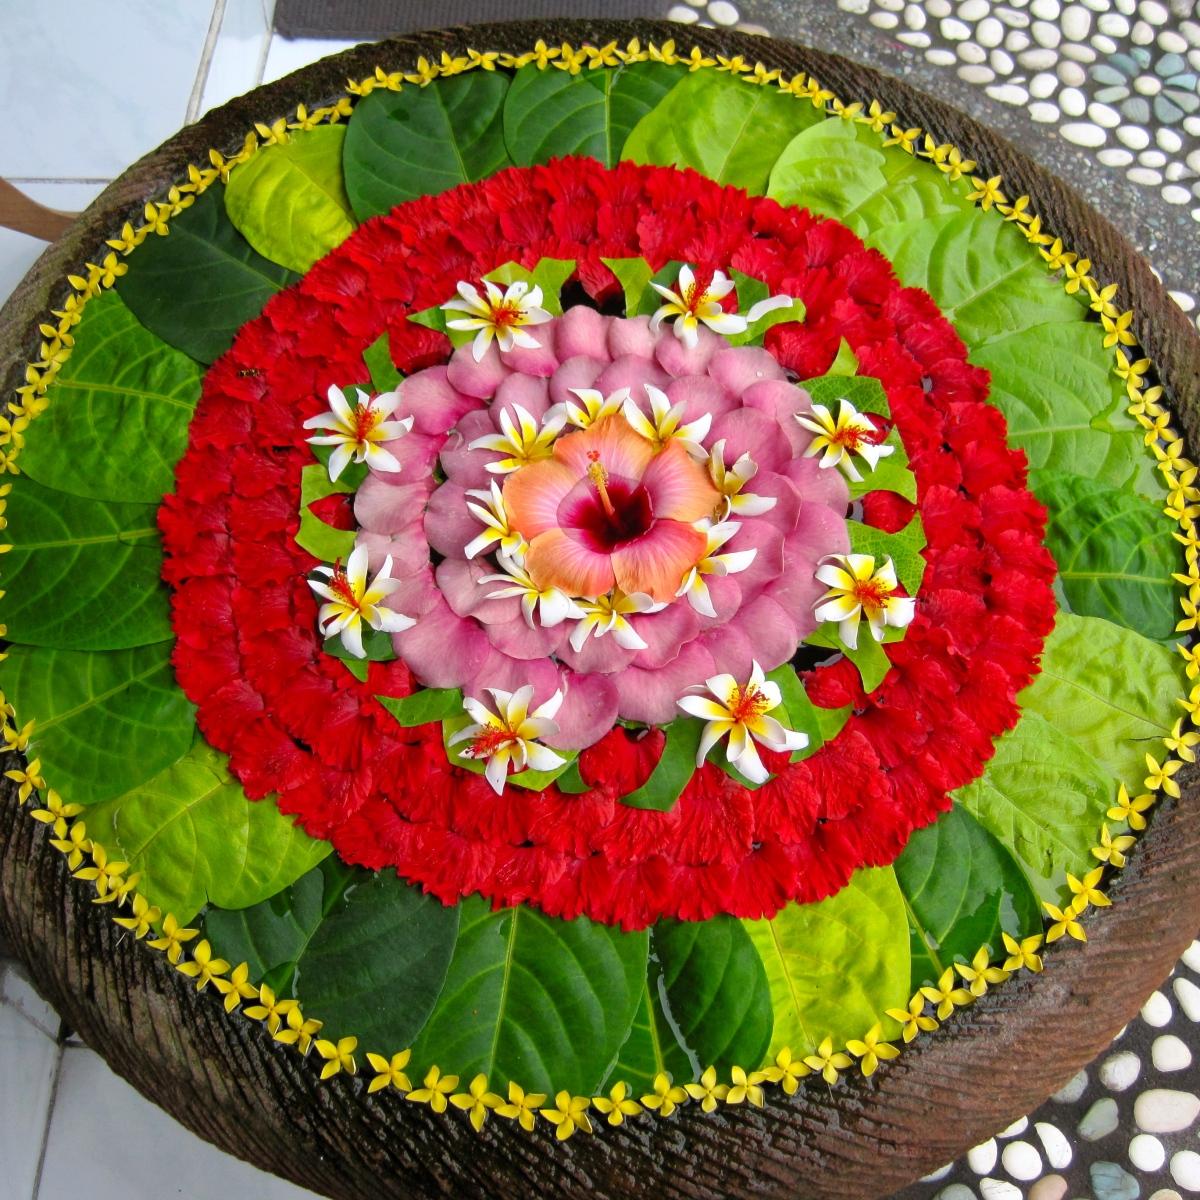 Bali's Exotic Flower Mandalas